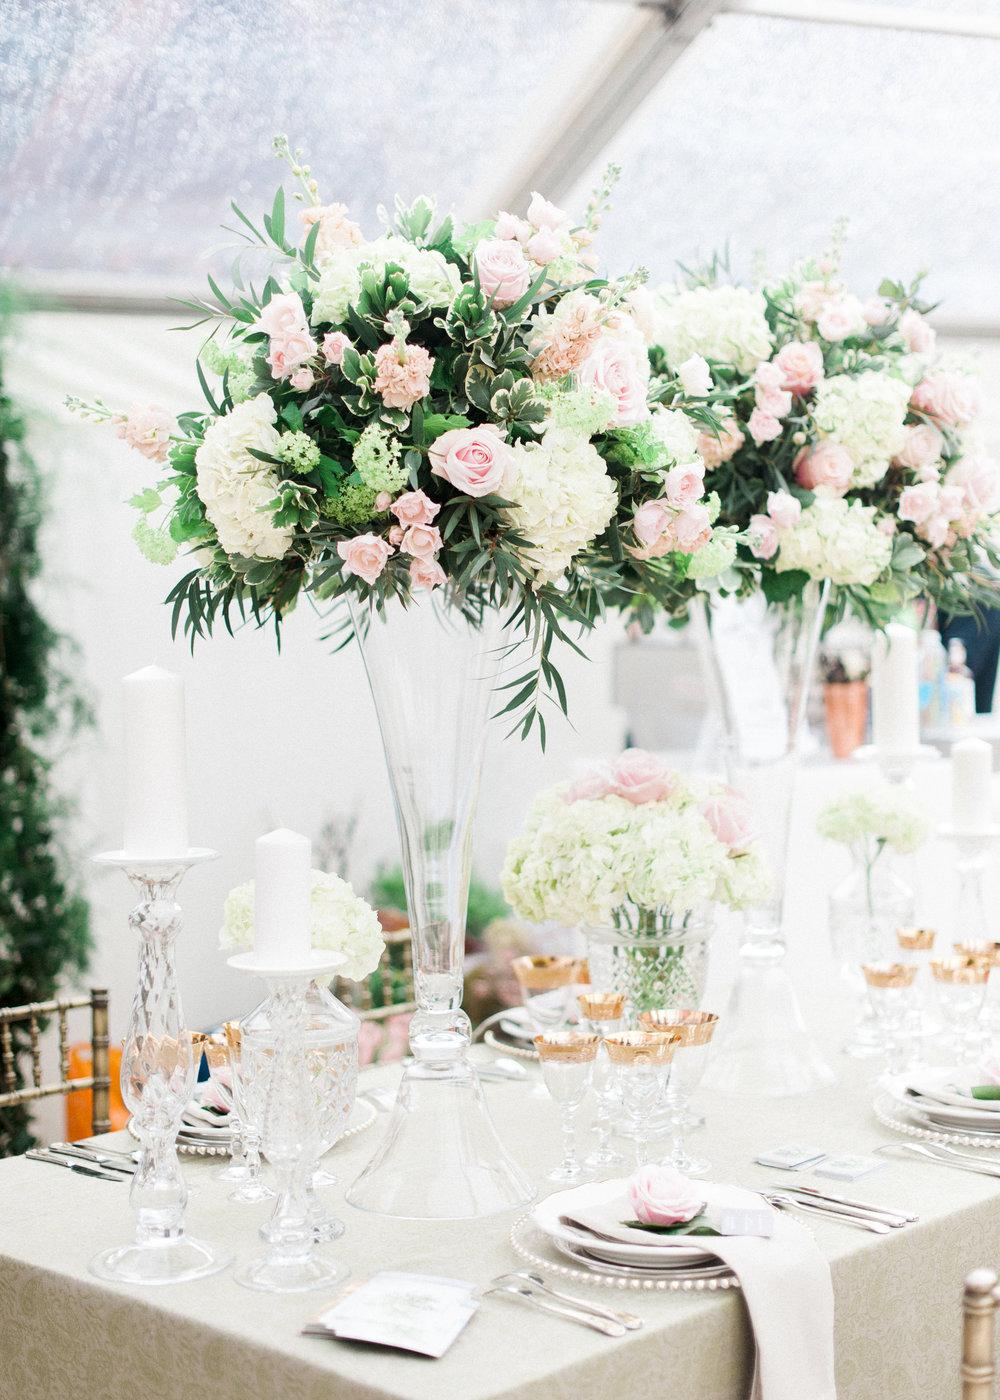 Buckinghamshire Wedding Florist WeddingShowcase At The Dairy Waddesdon Manor 5th March 2017